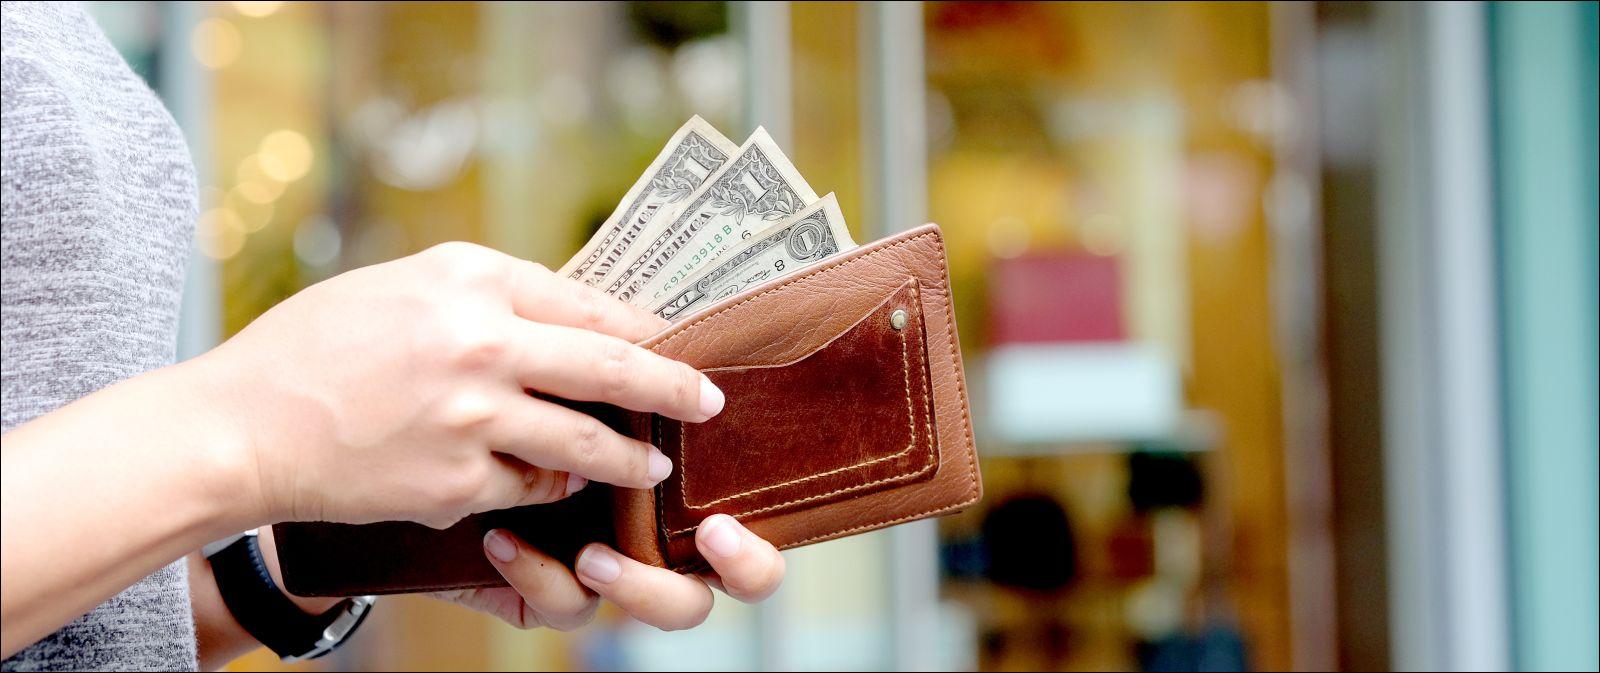 Woman pulling dollar bills from wallet